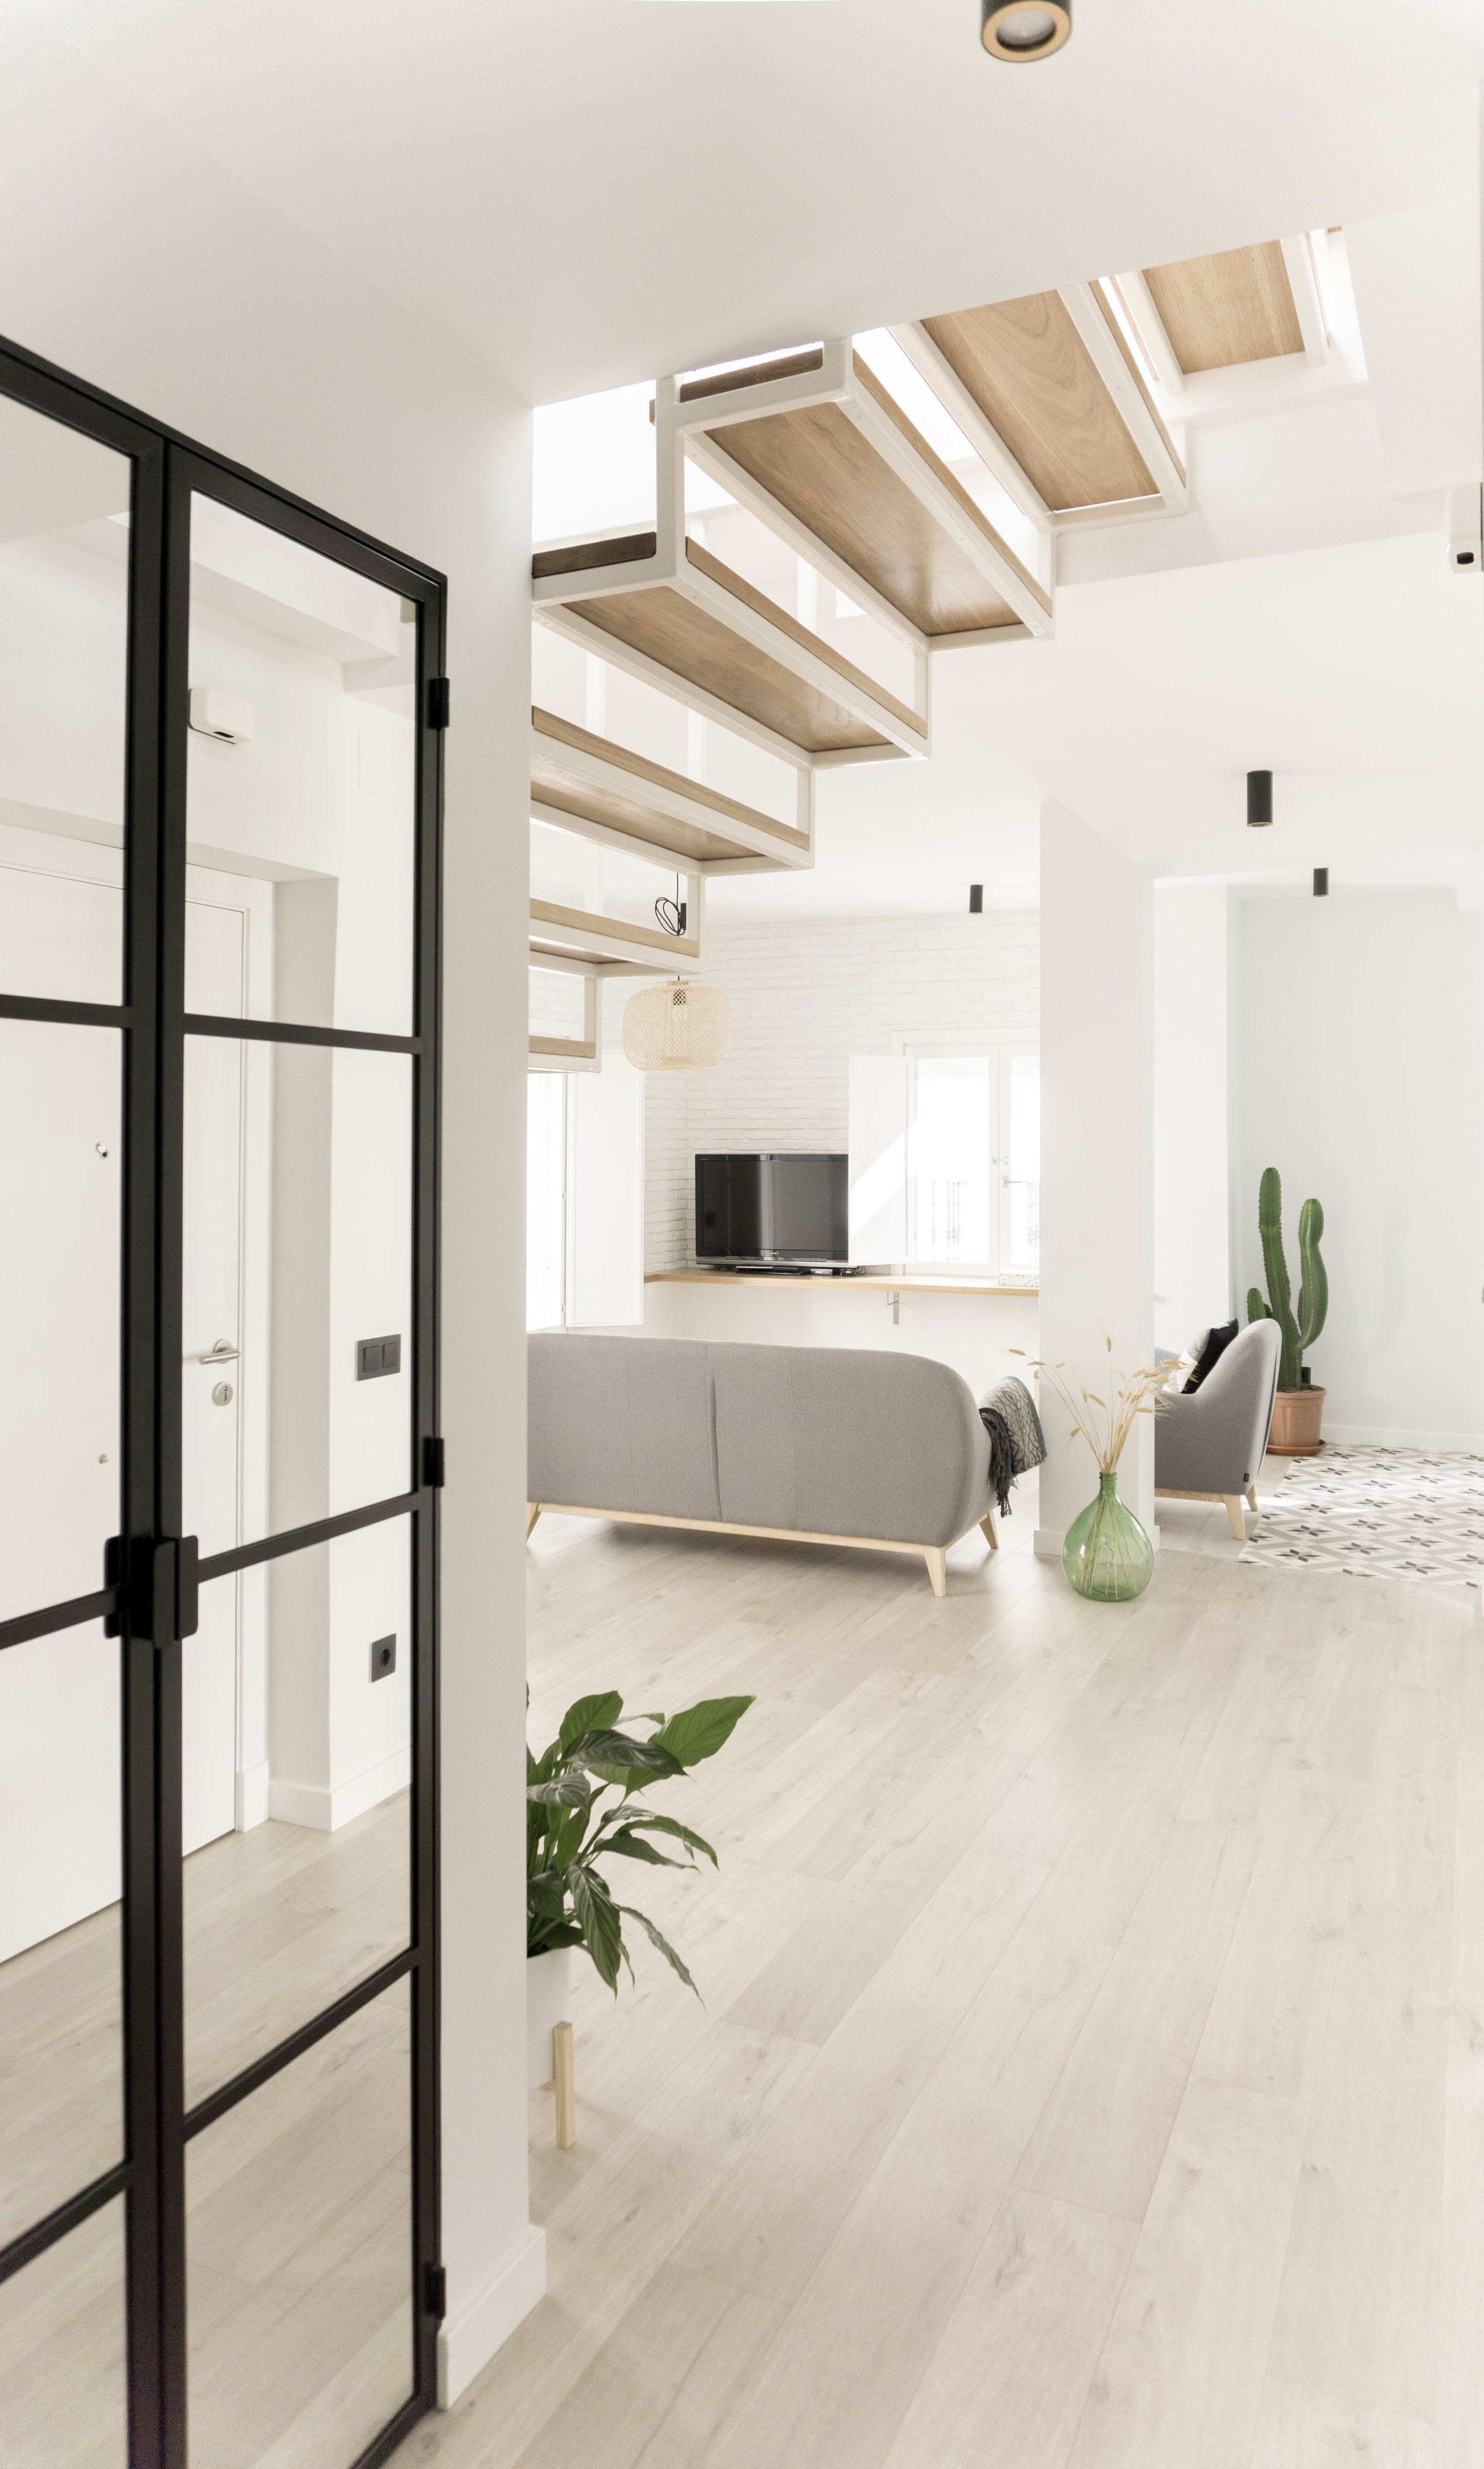 emmme studio viviendas slow design.jpg